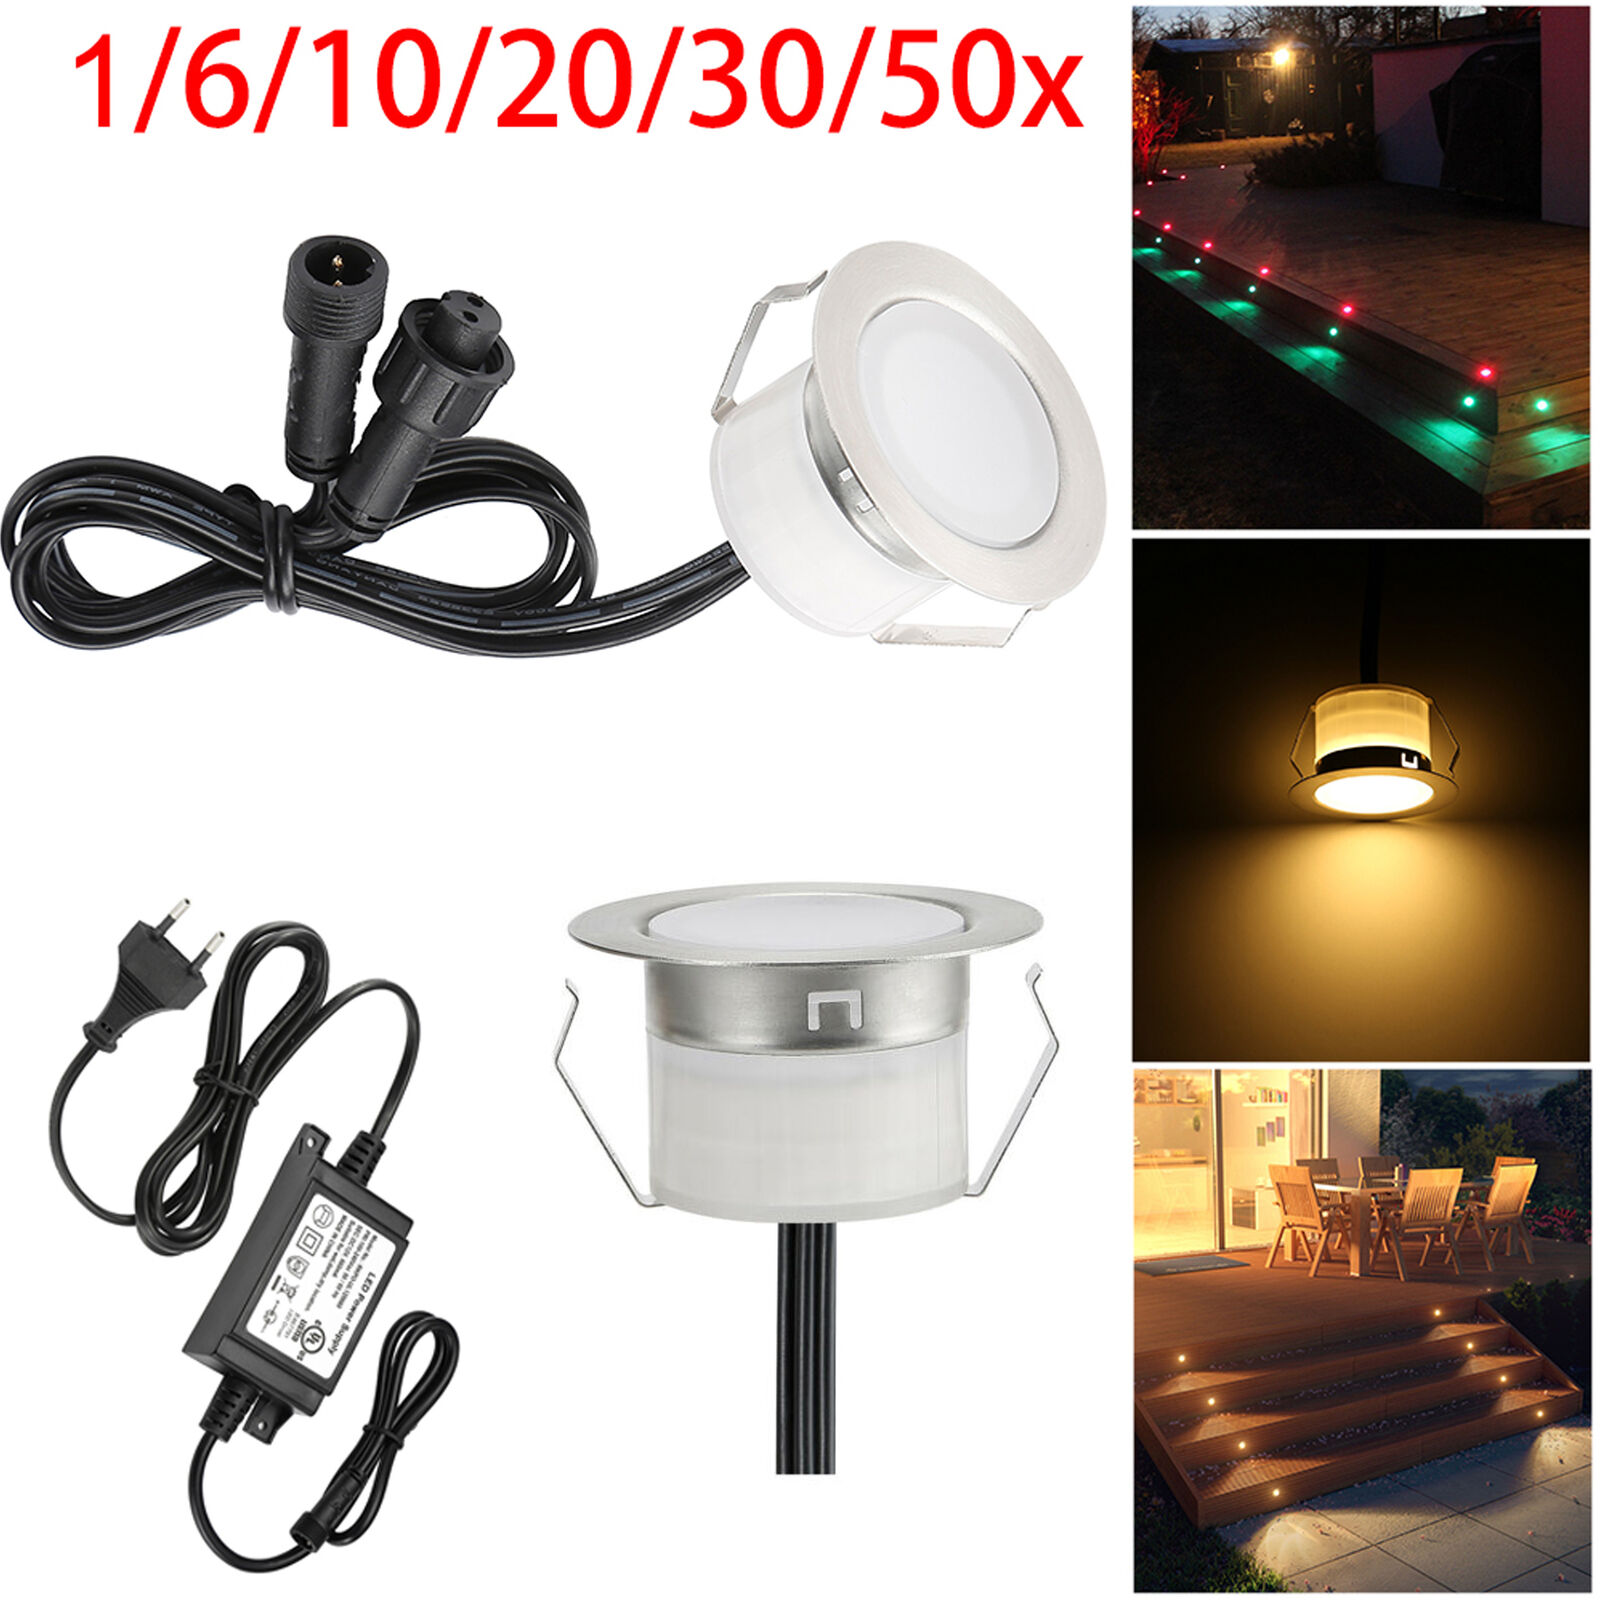 1-50er Set RGBW Warmweiβ RGB LED Bodeneinbaustrahler Einbauleucht Terrasse Lampe